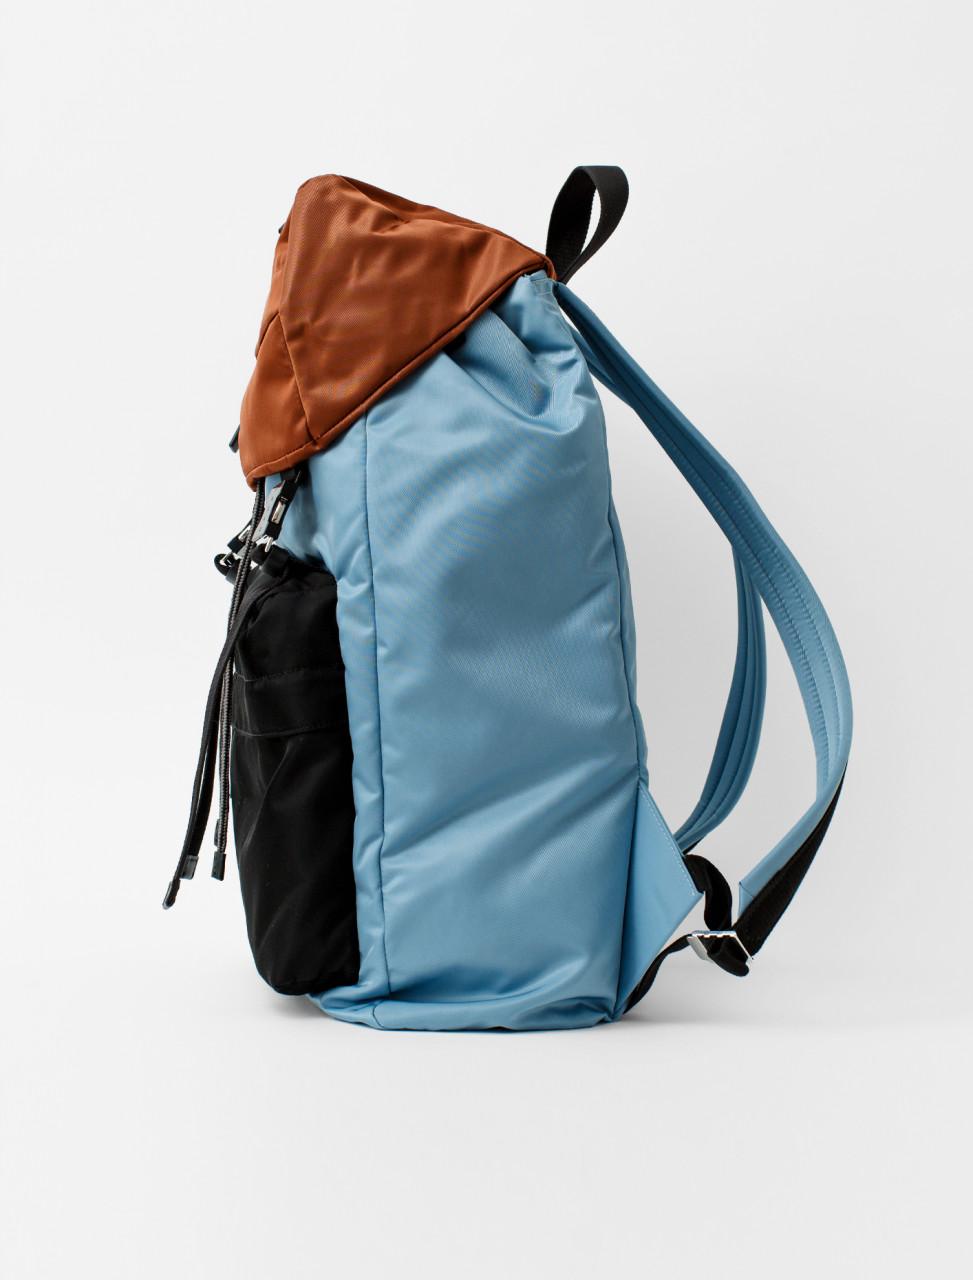 Nylon Backpack in Lake, Rust and Black